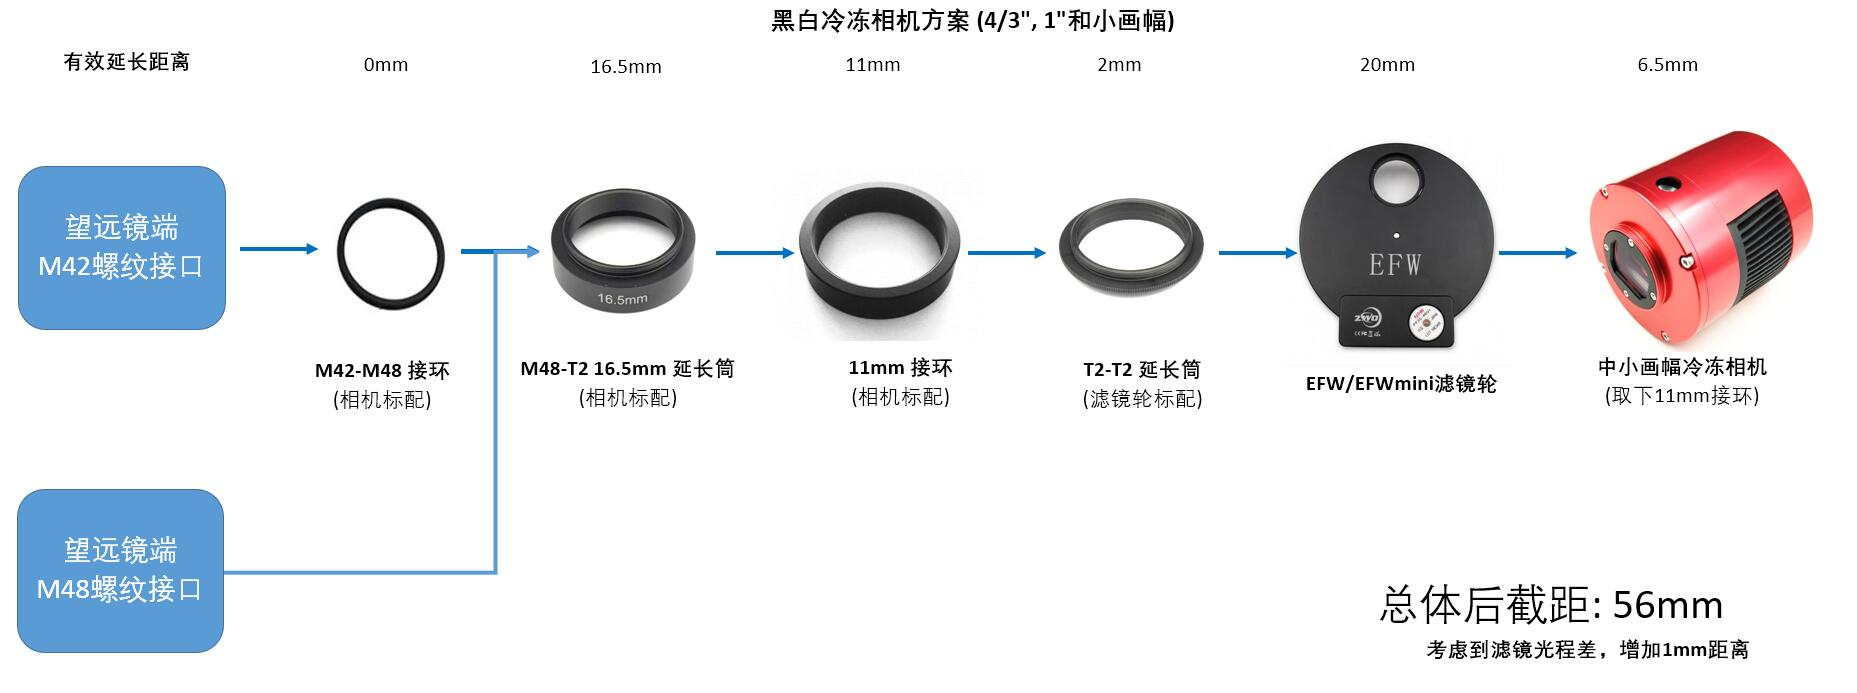 Cooled Mono Camera solution(中文).jpg